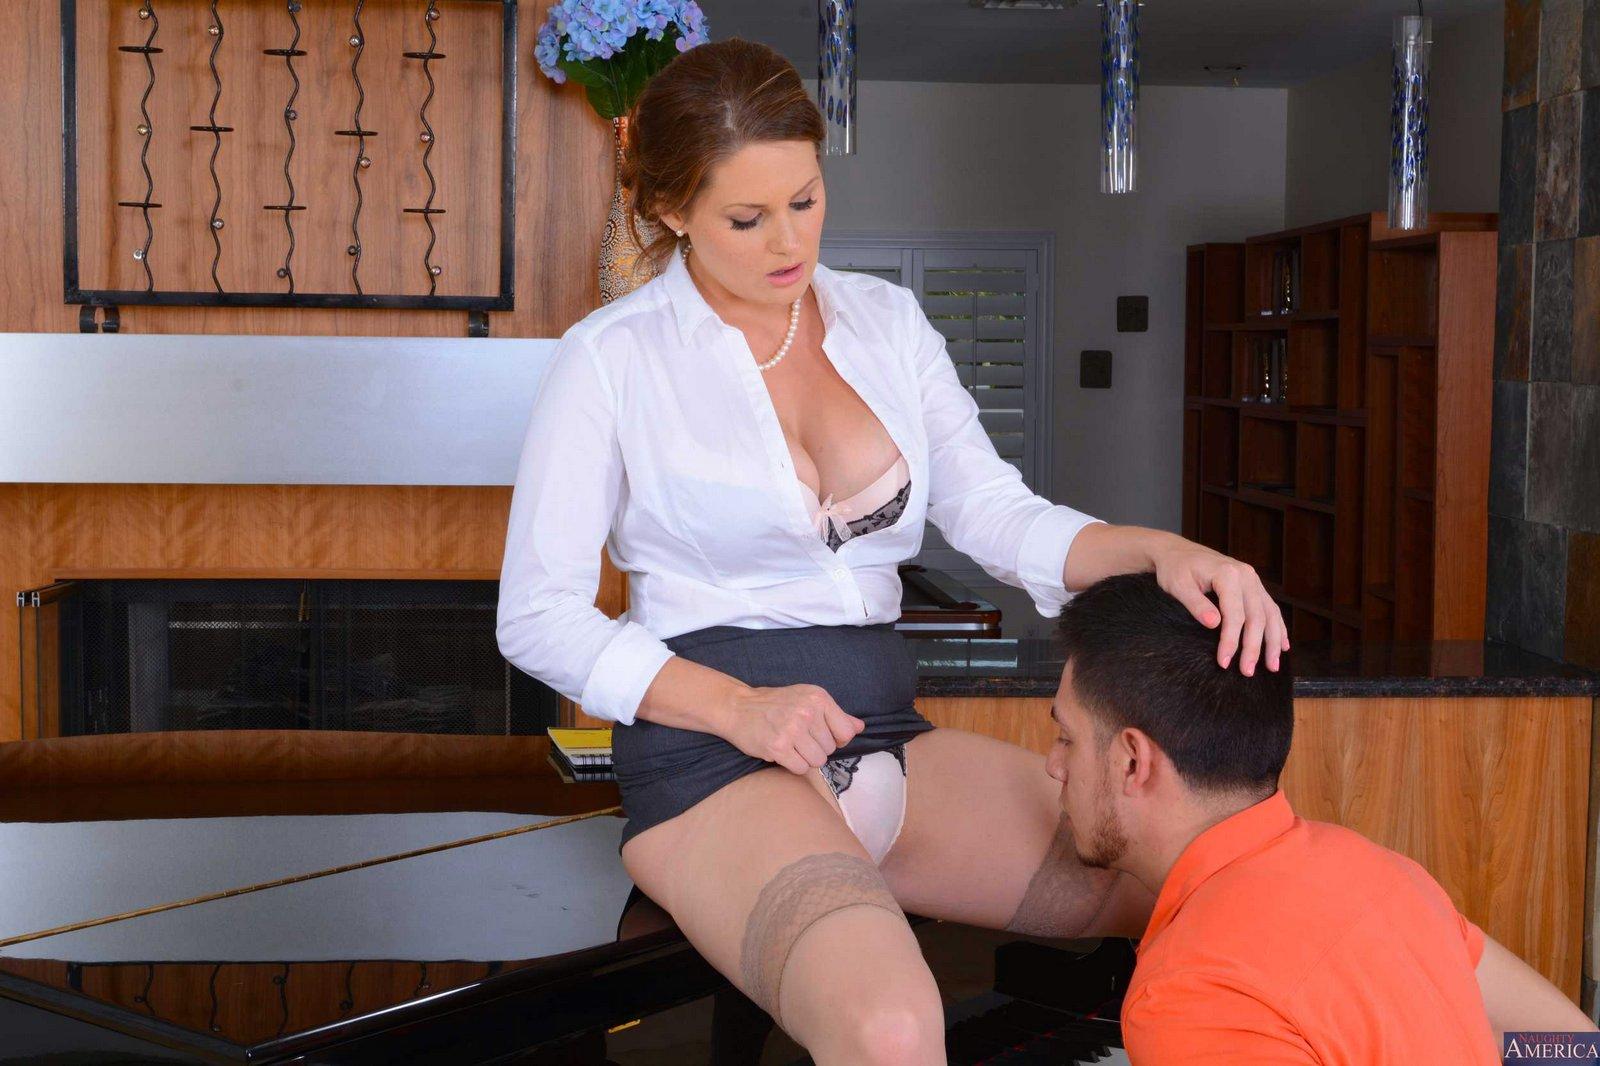 Teen and teacher naughty relationship - 1 part 8